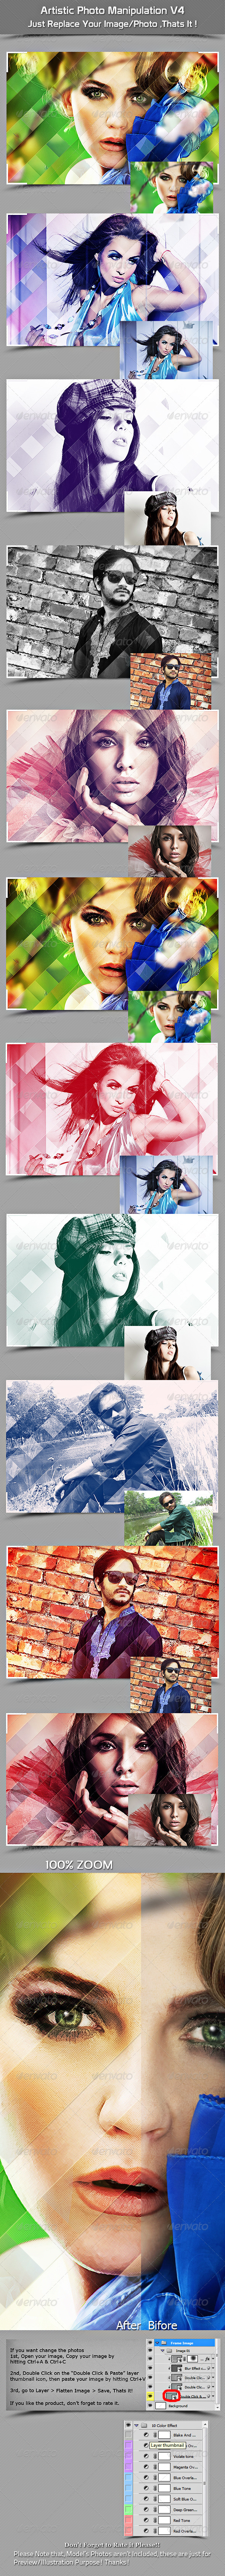 GraphicRiver Artistic Photo Manipulation V4 7482588